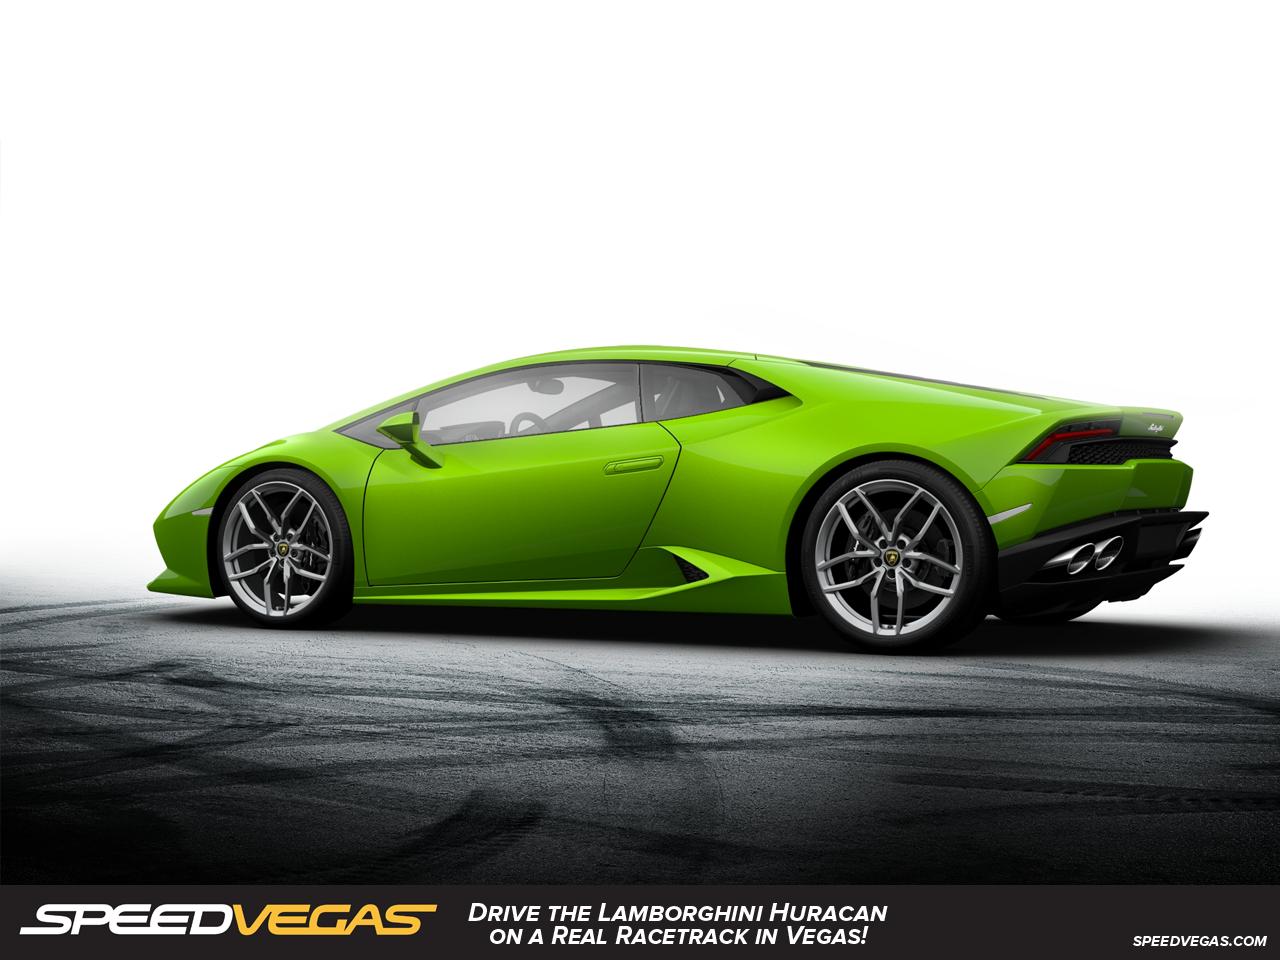 Porsche Driving Experience >> Drive a Lamborghini Huracan in Las Vegas: Lamborghini Driving Experience | SPEEDVEGAS